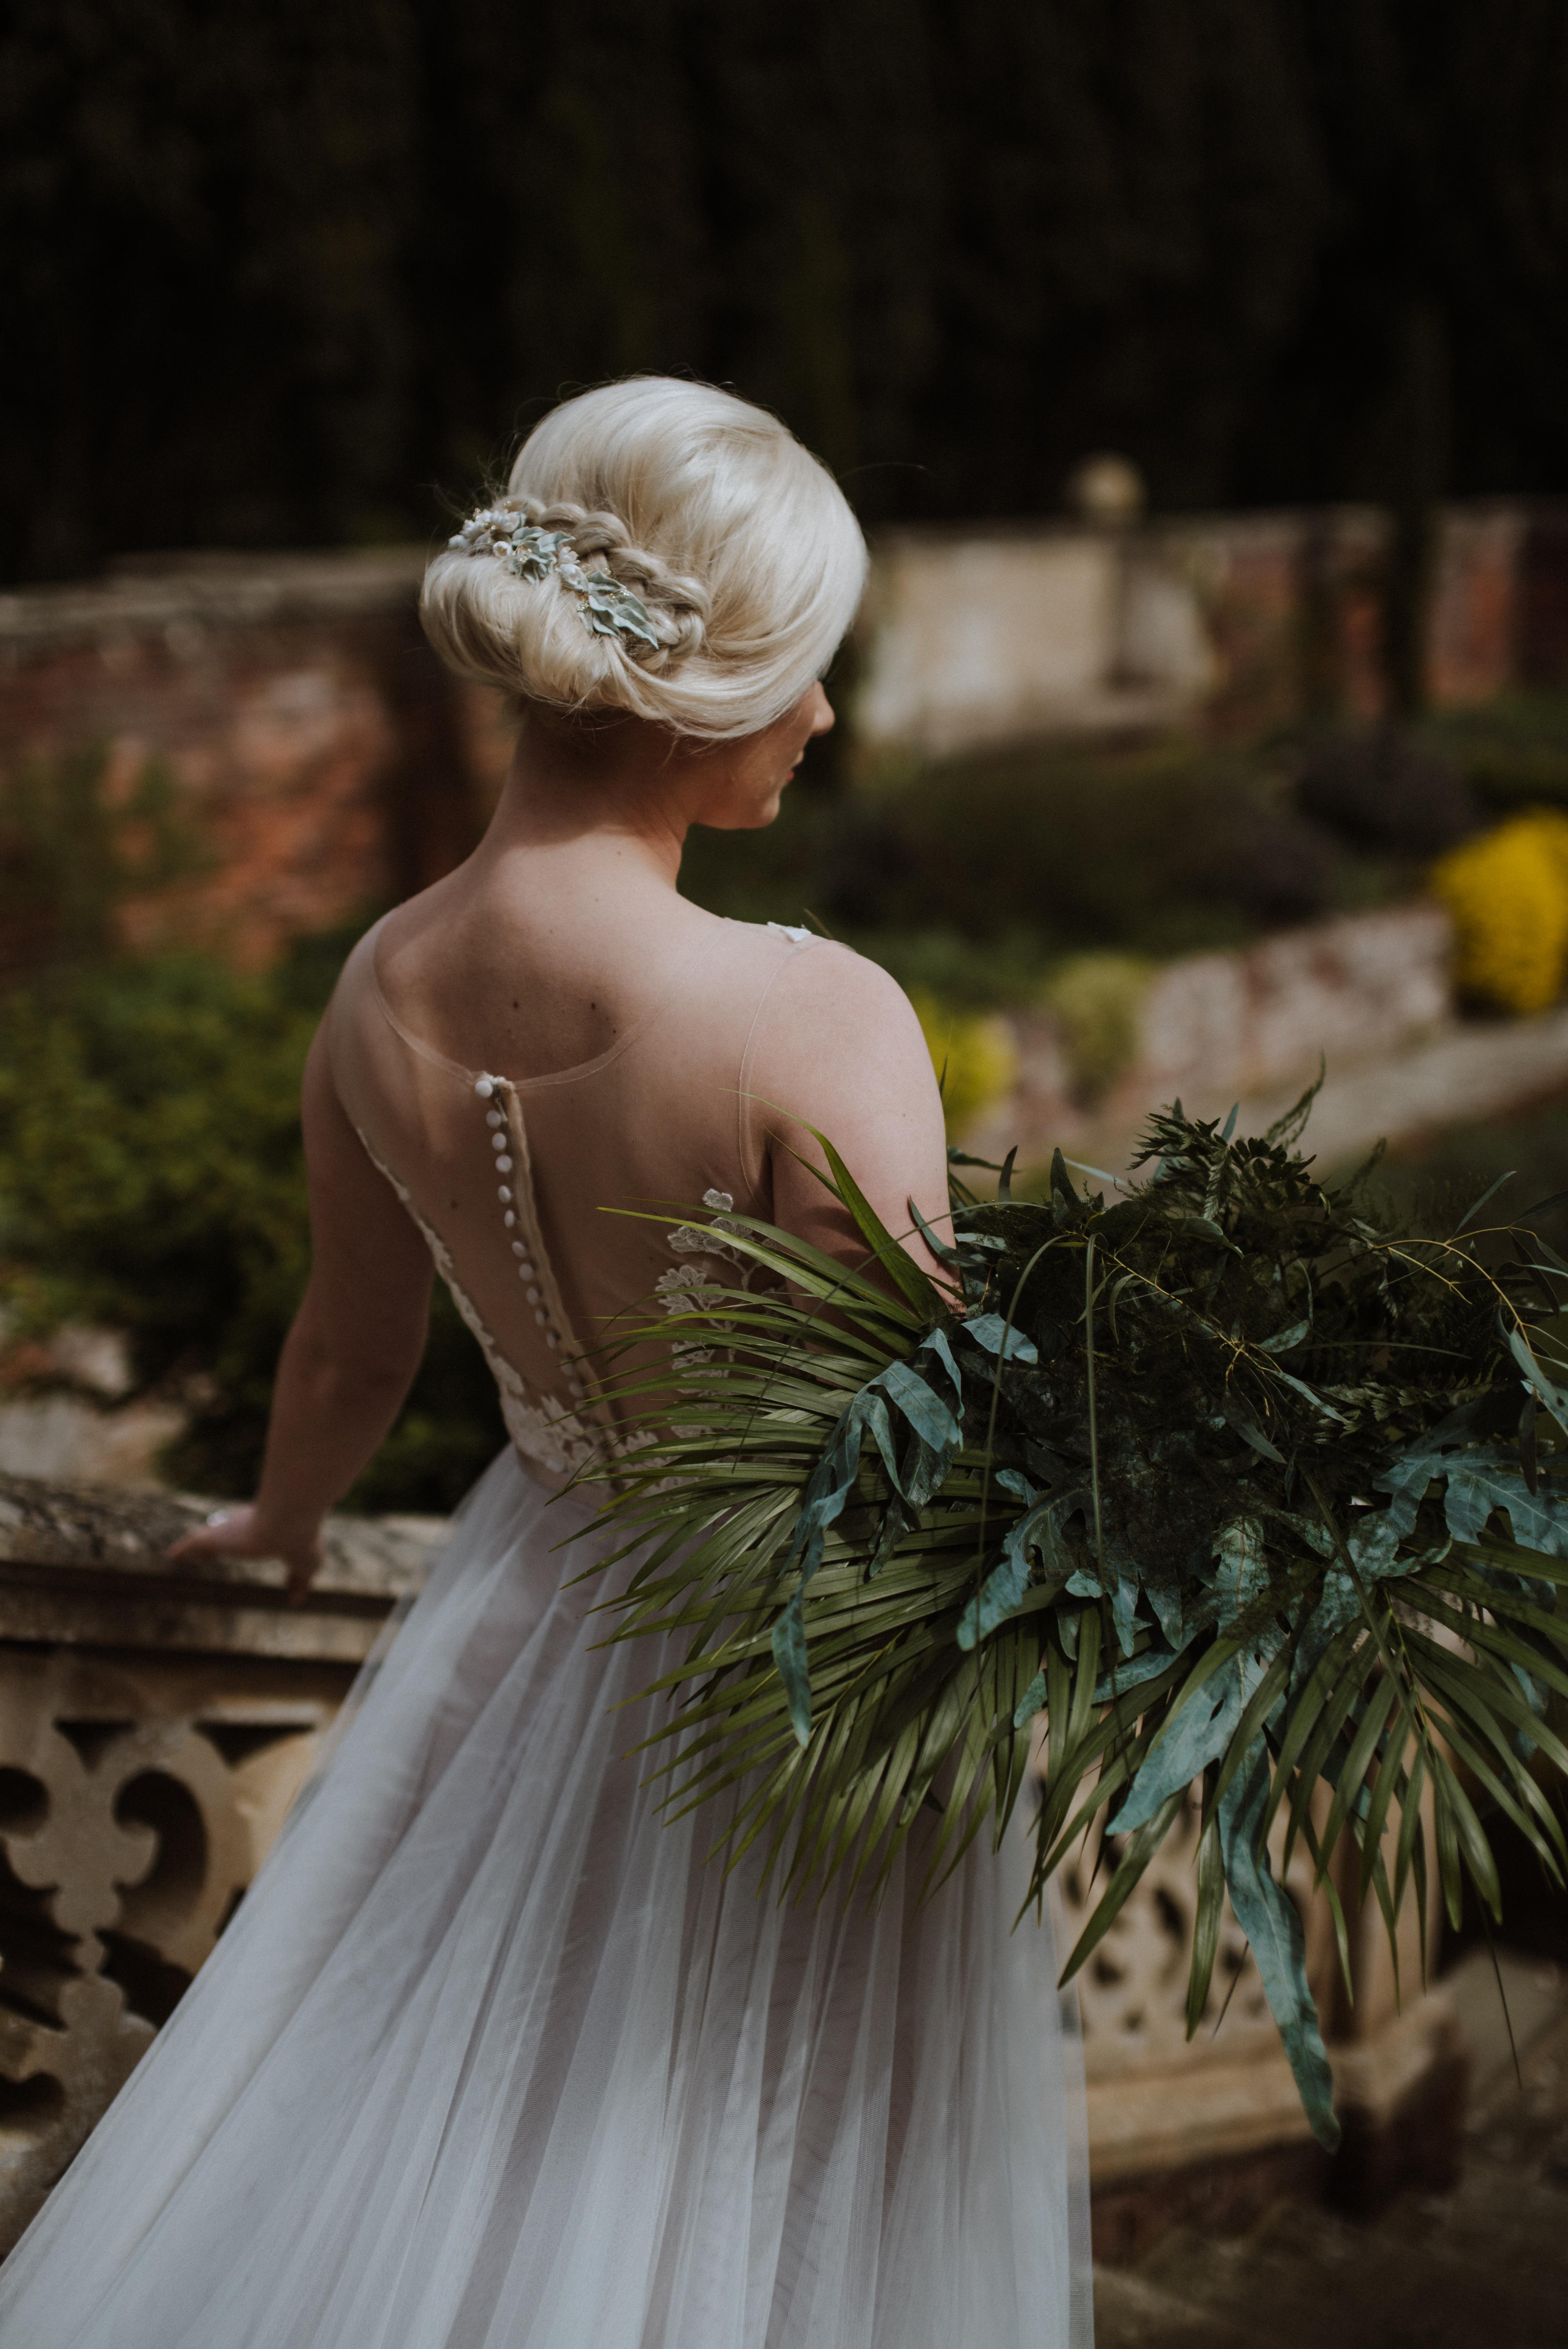 bridal headpiece, bridal hair vine, bridal headdress, bridal tiara, tiara, bohemian bride, statement headpiece, wedding headpiece, wedding hair accessories, bridal hair accessories, wedding tiara, wedding headpiece, floral headpiece, bridal crown